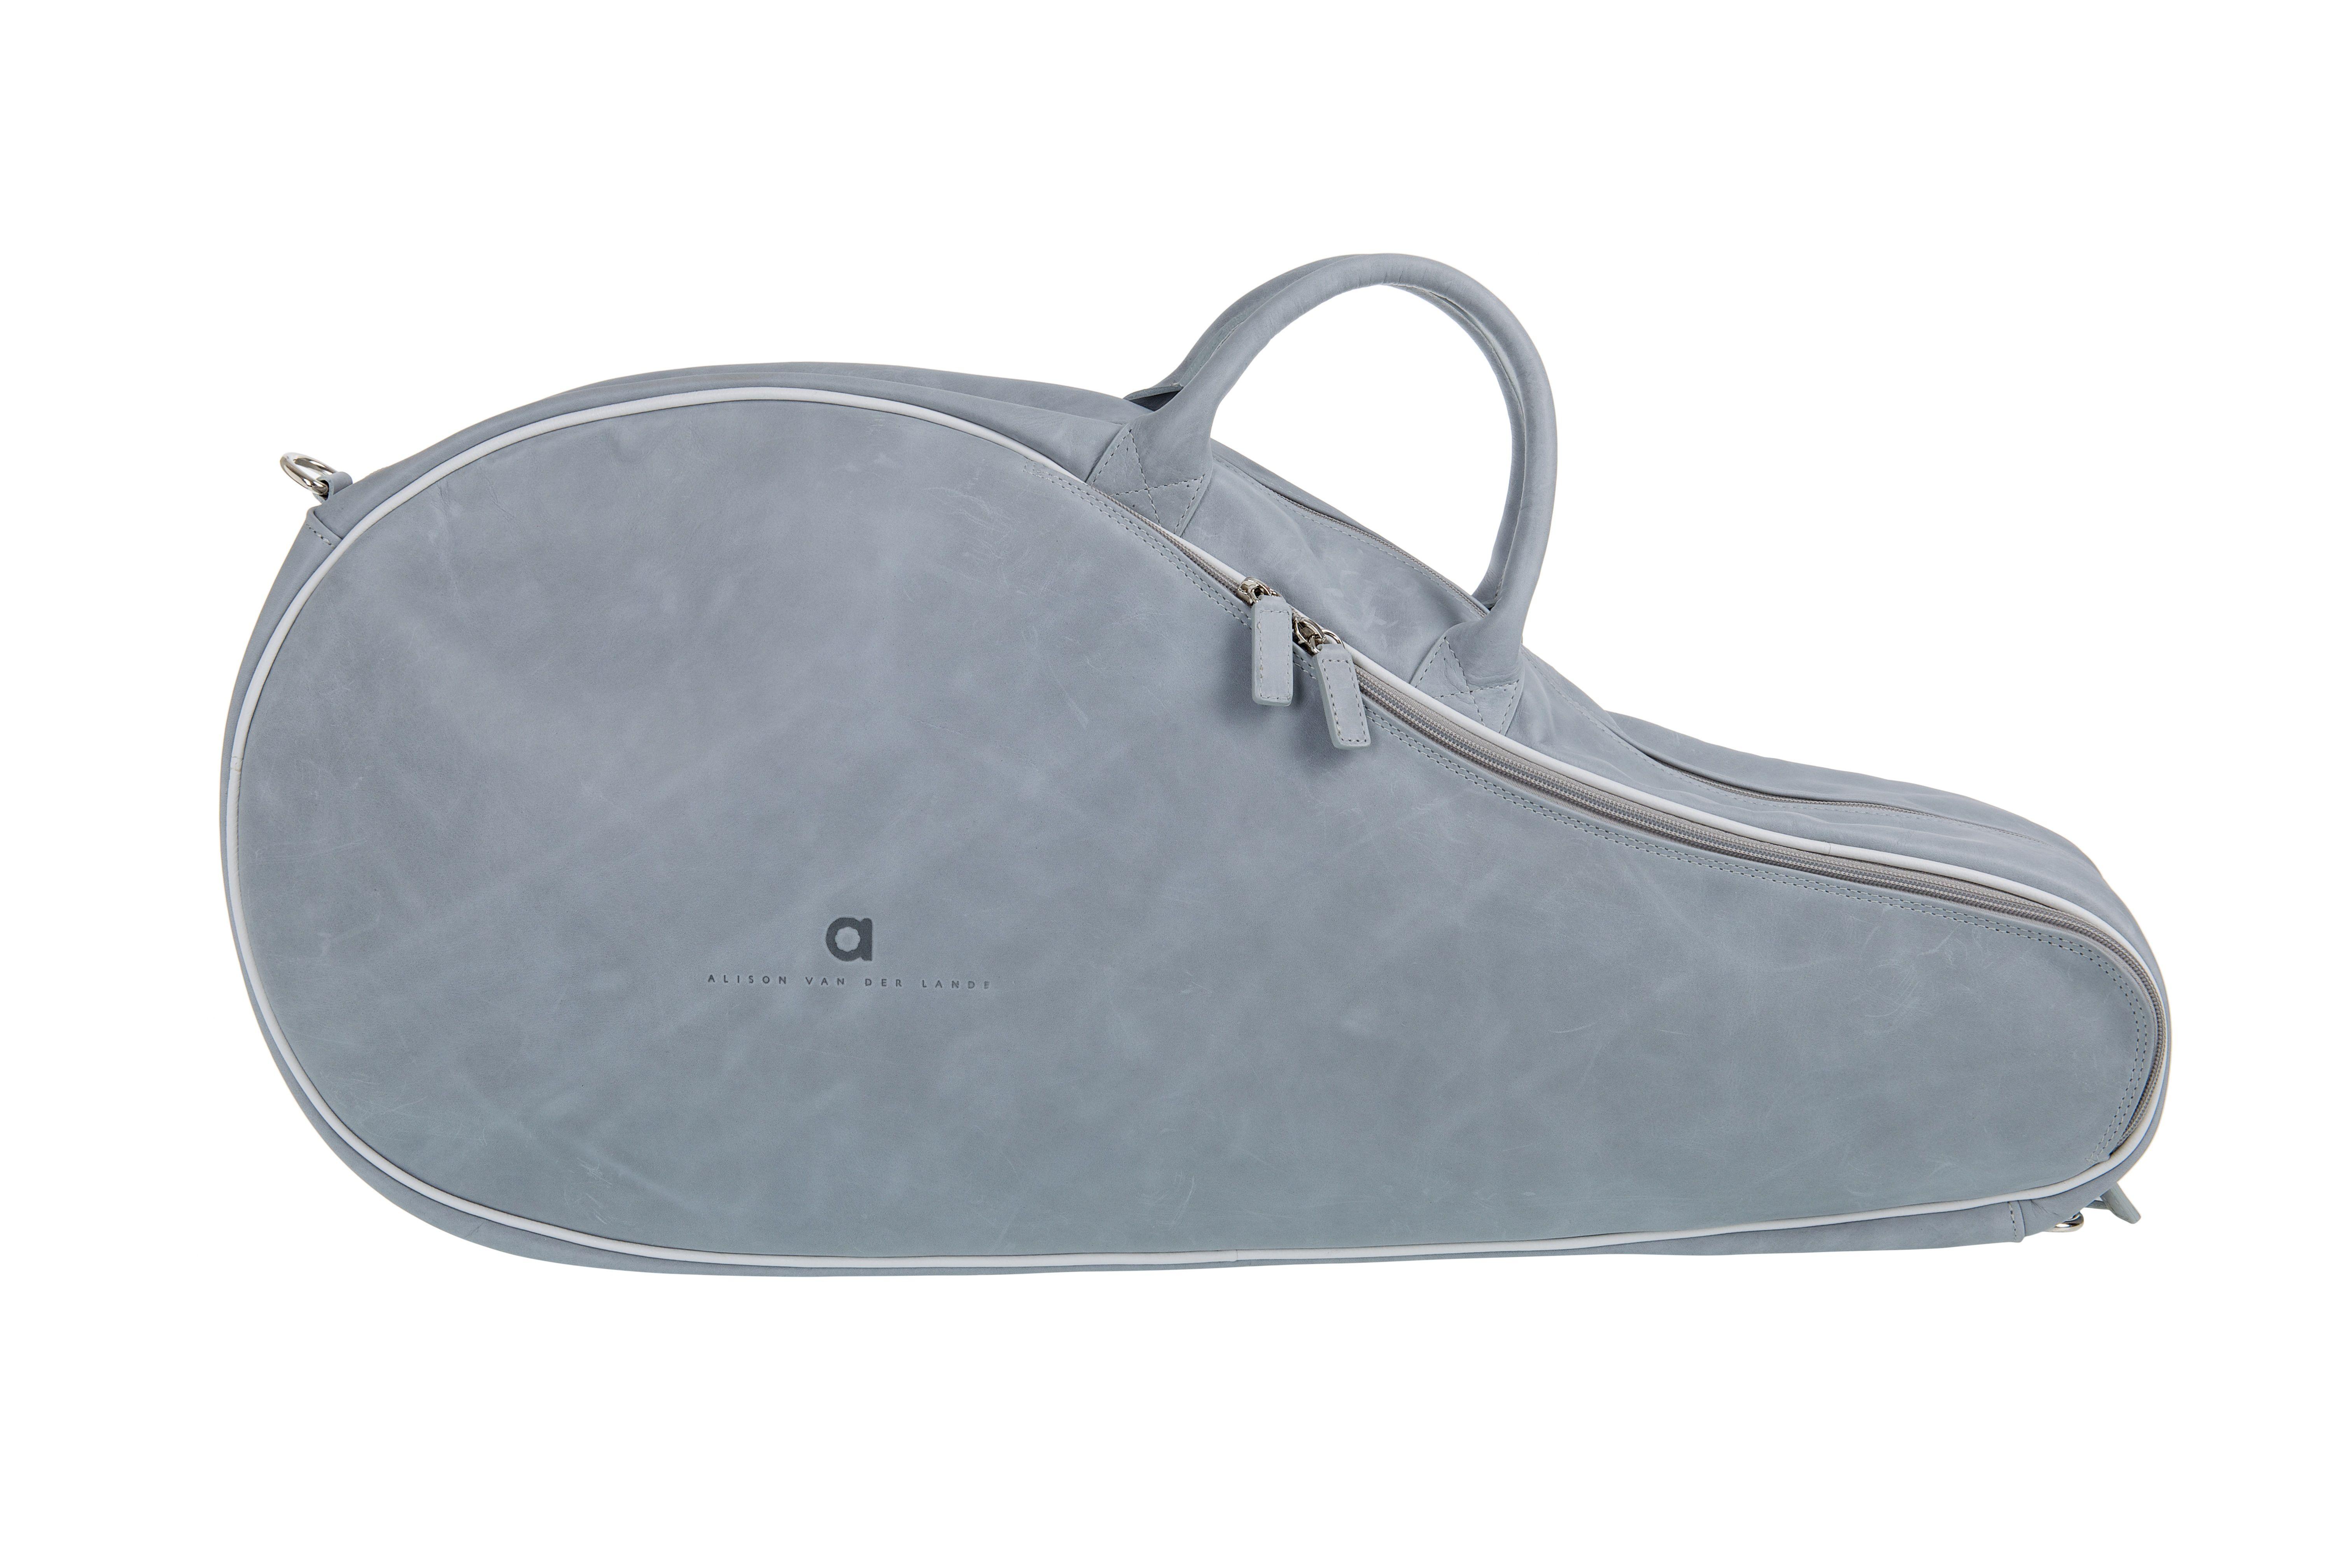 Five Questions With Luxury Tennis Bag Designer Alison Van Der Lande Tennis Bag Bags Designer Badminton Bag